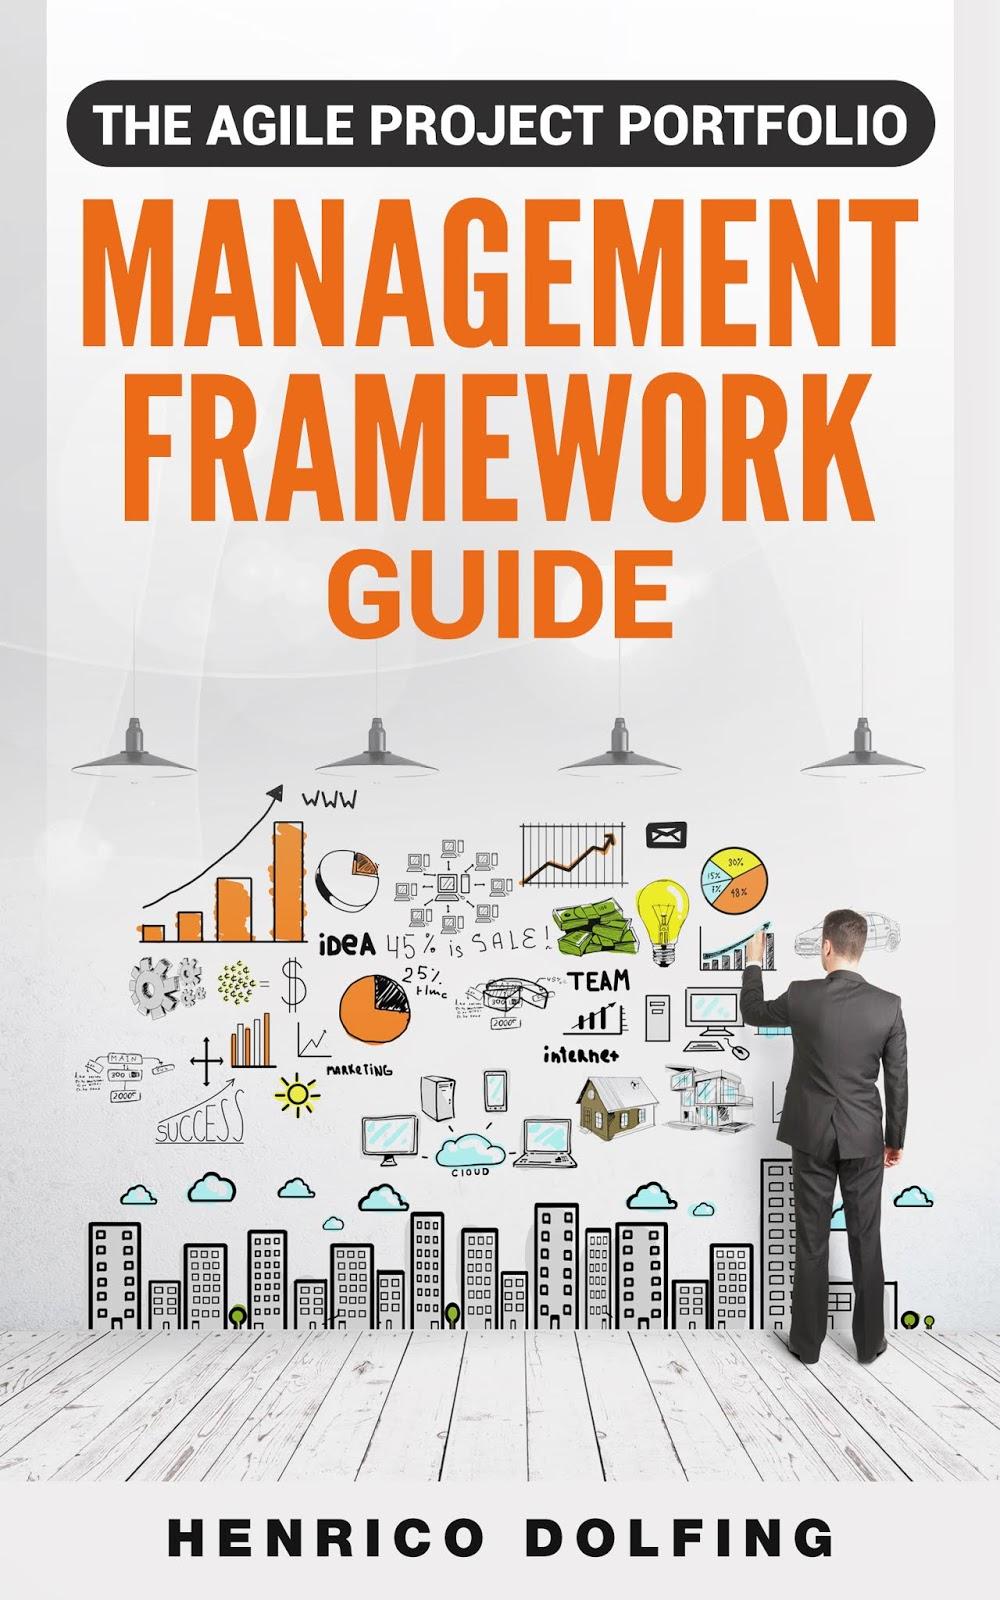 medium resolution of agile project portfolio management framework guide